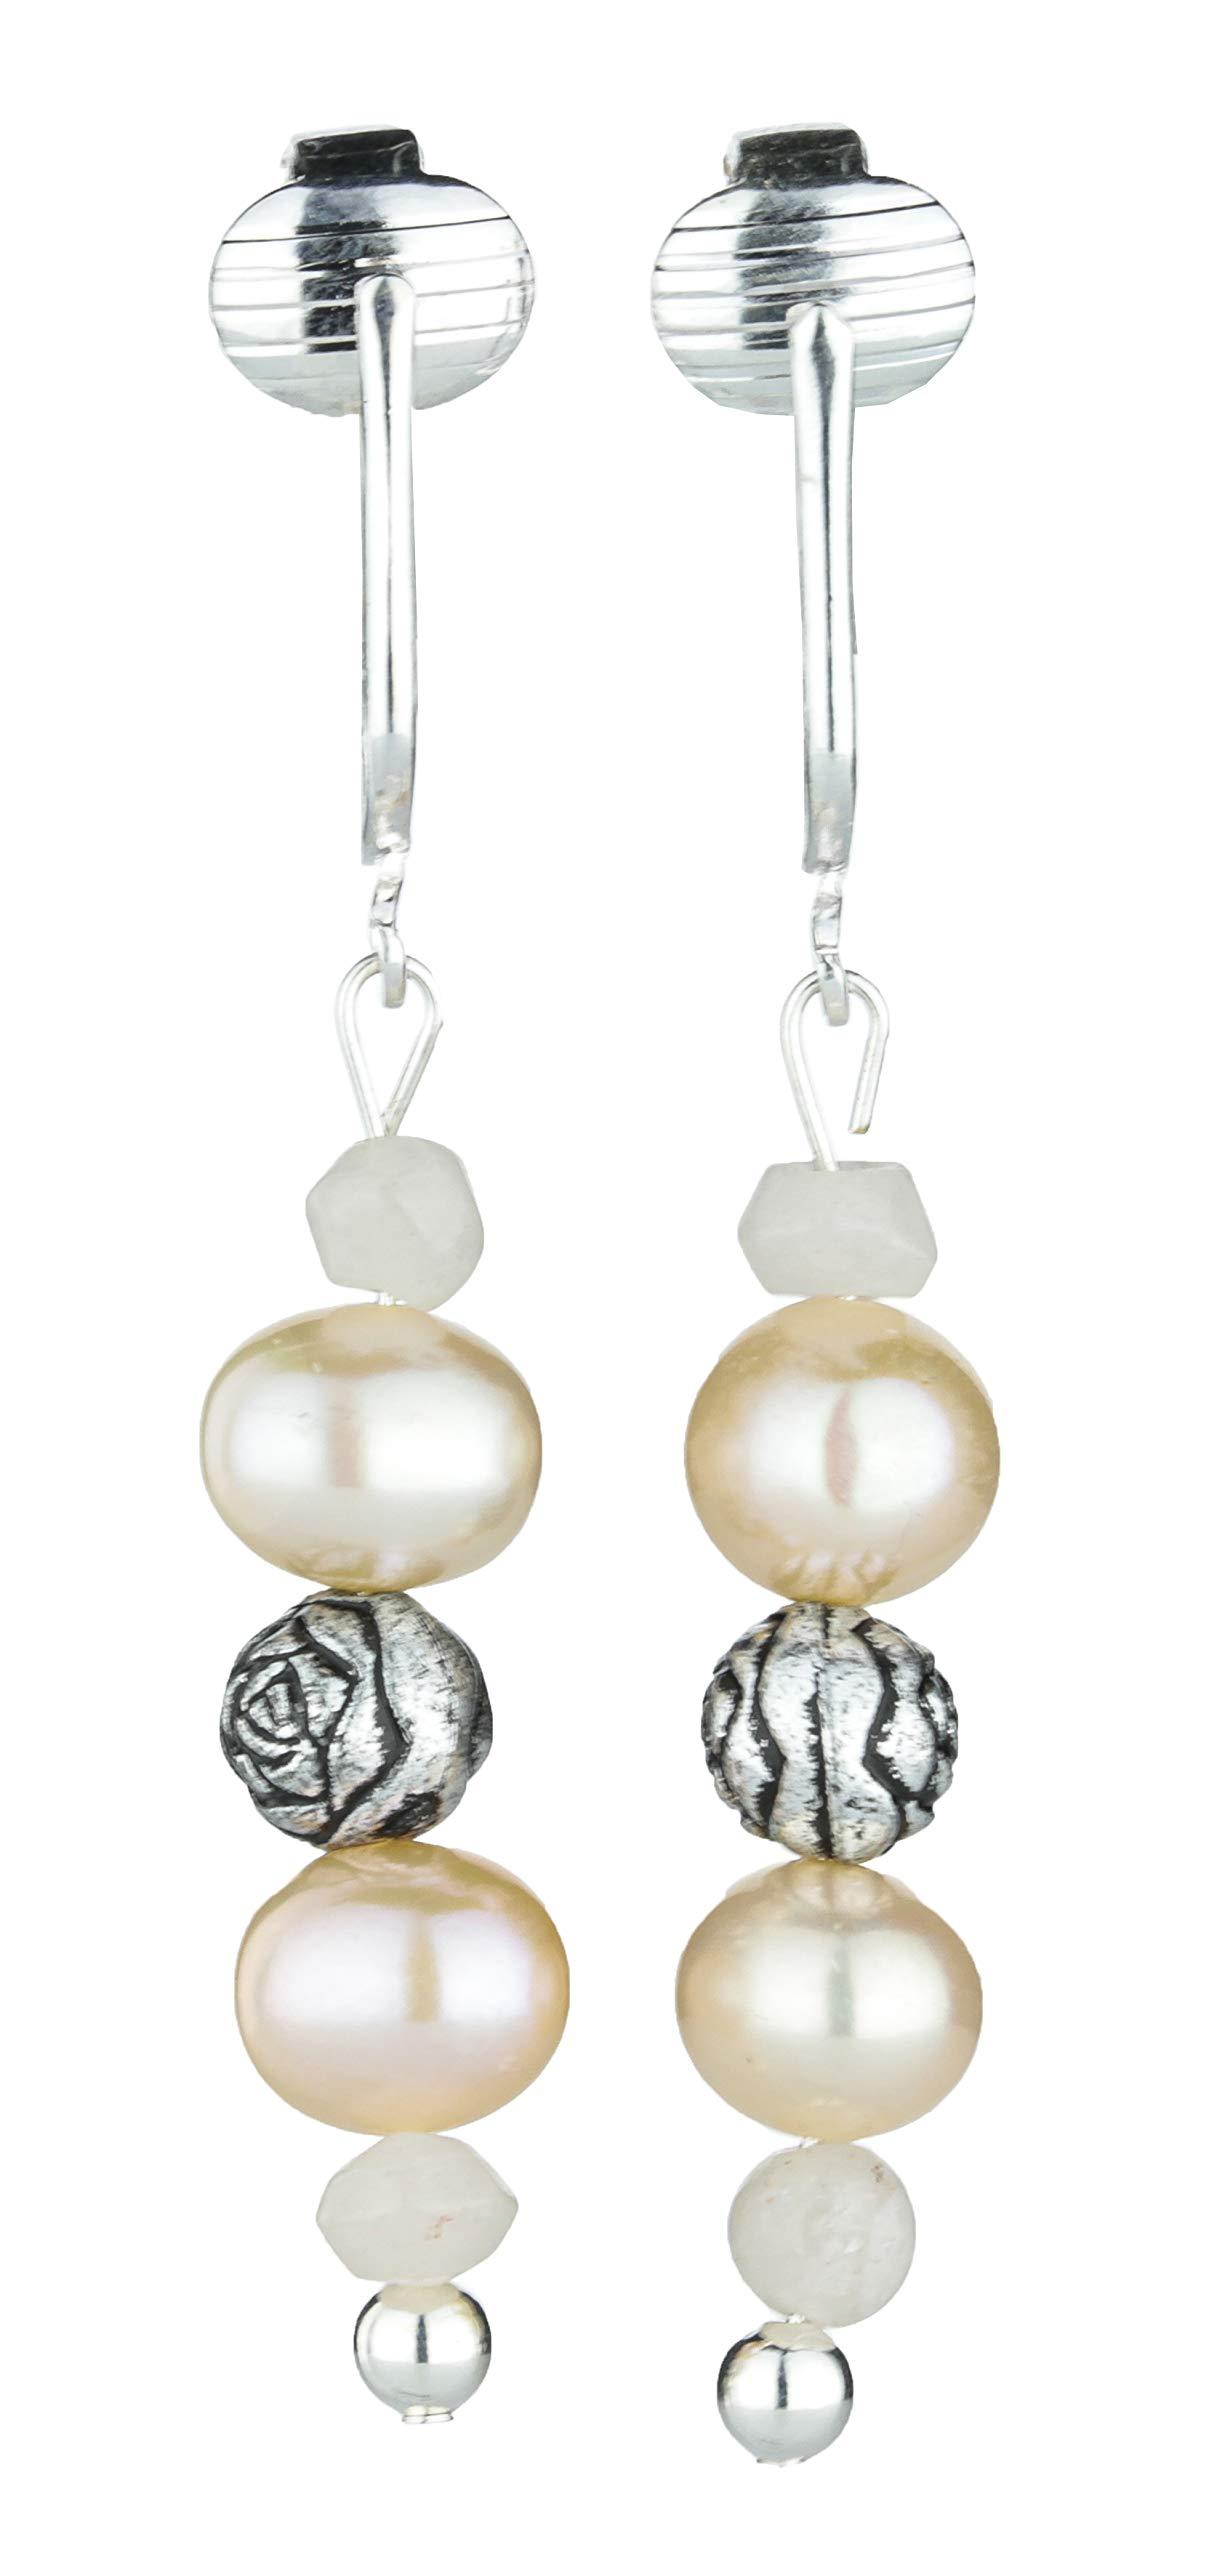 Aloha Earrings Cultured 6-7mm Freshwater Pearl Dangle Earrings w/Silver-tone Rose Beads & 4 mm Pink Quarts by Aloha Earrings